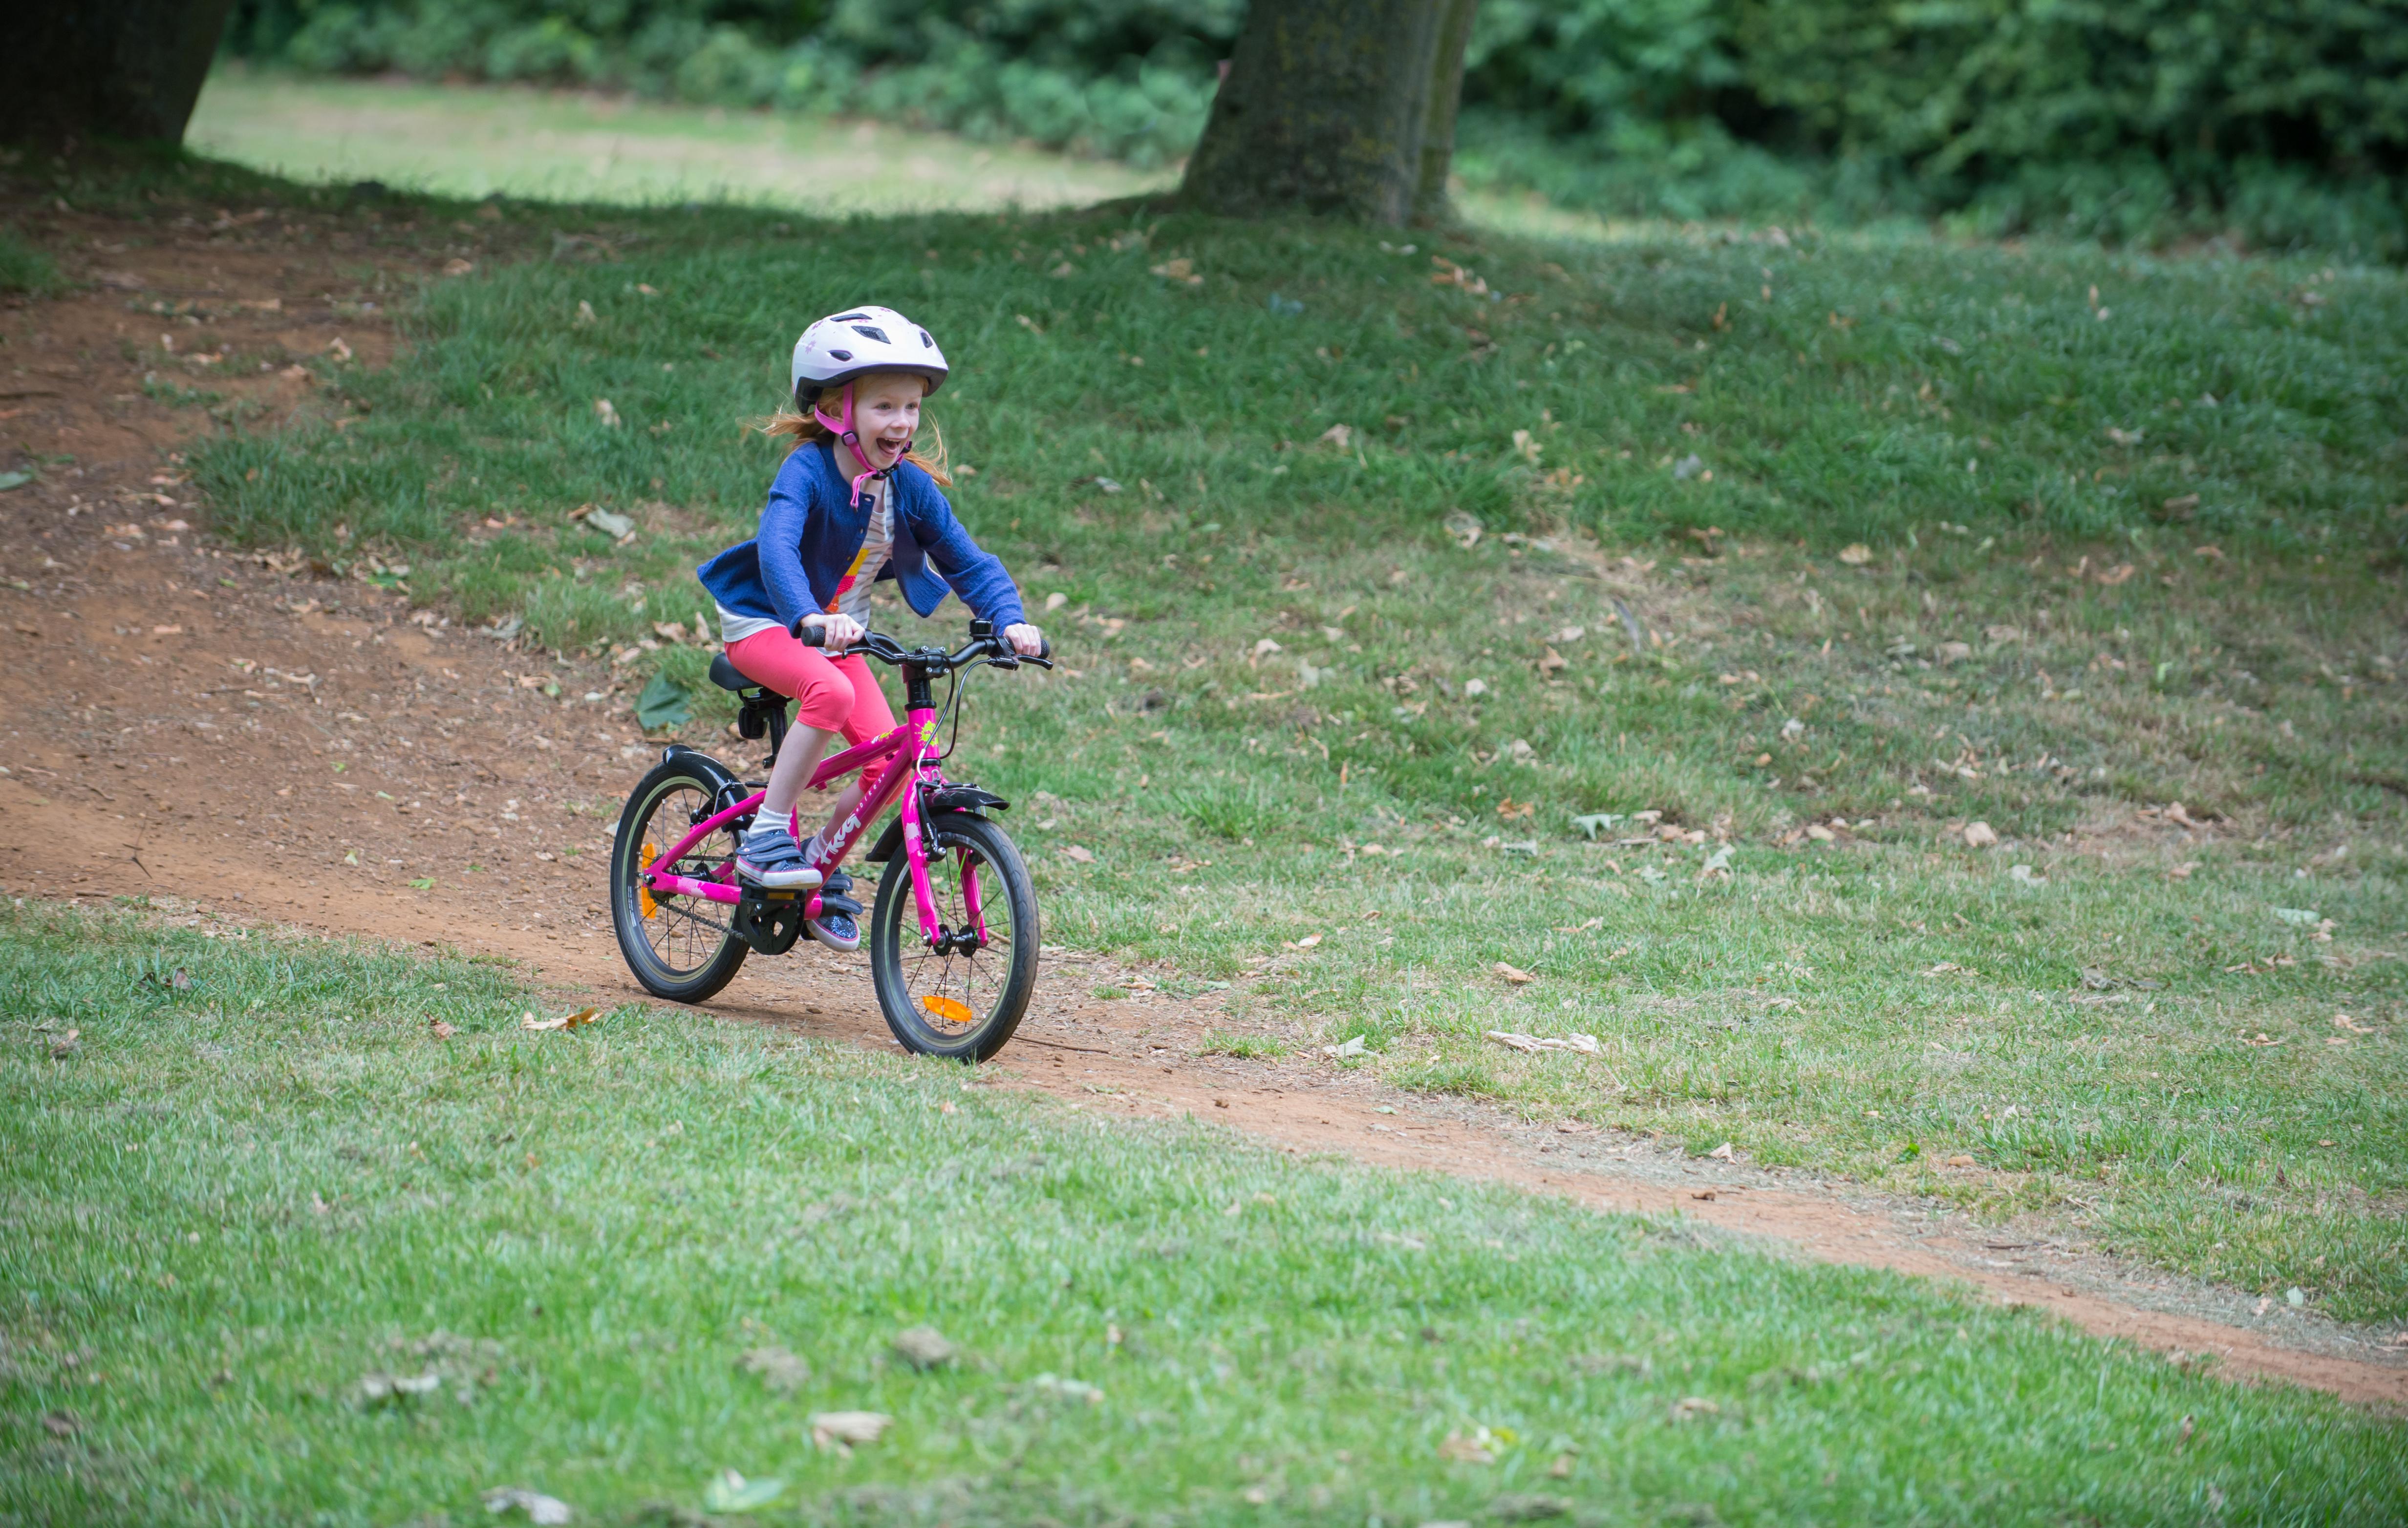 Girl riding bike downhill